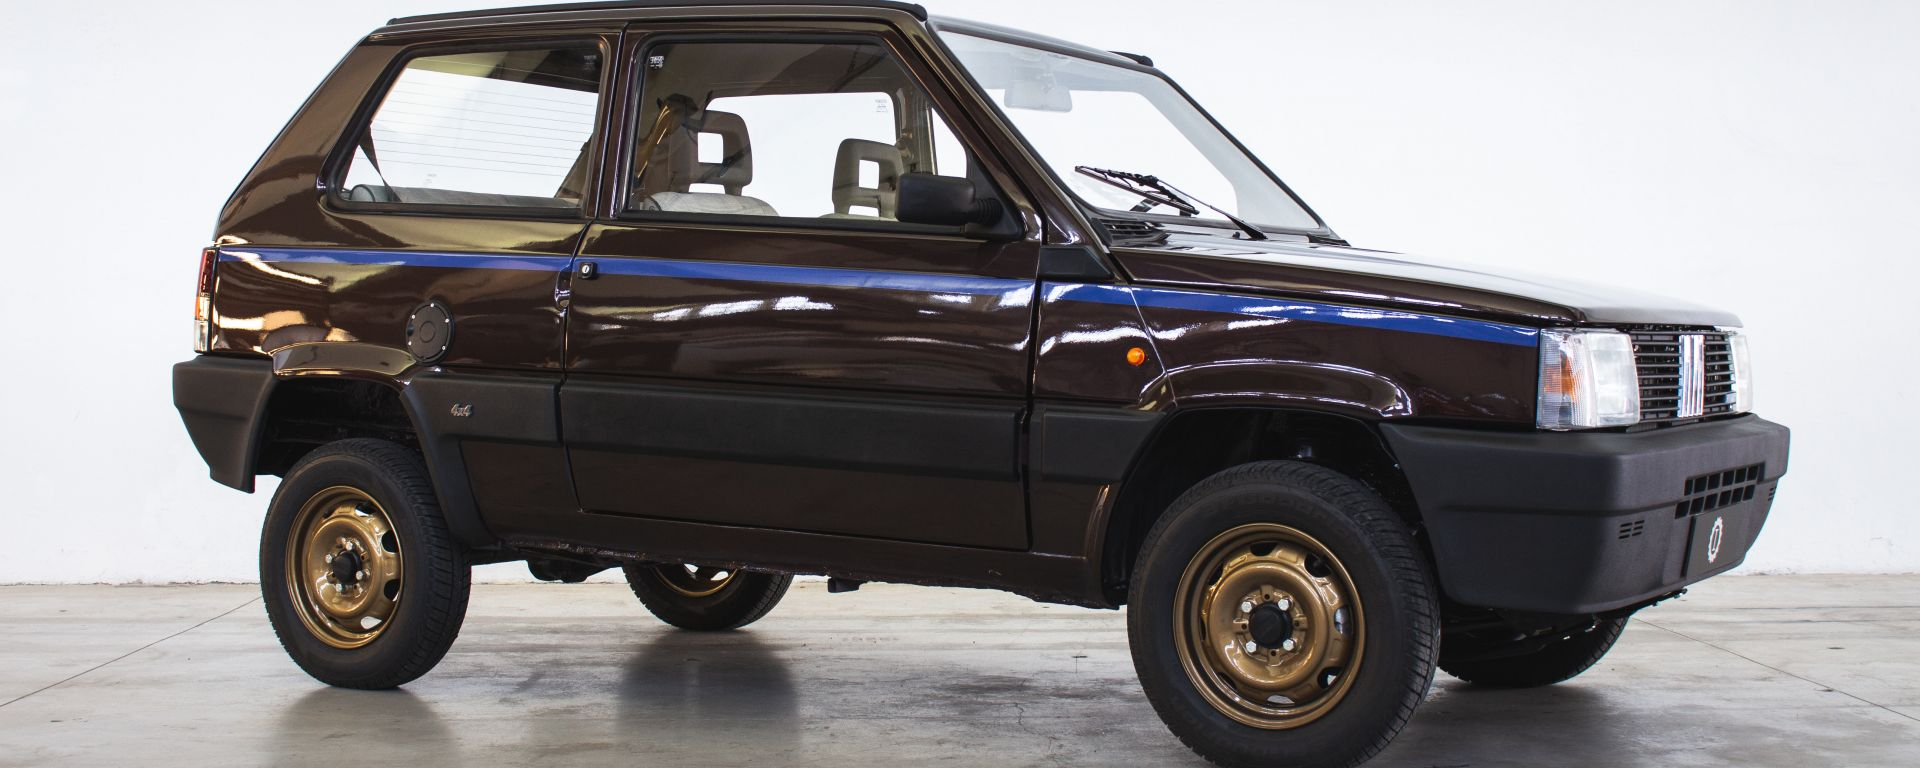 Fiat Panda 4x4 Icon-e